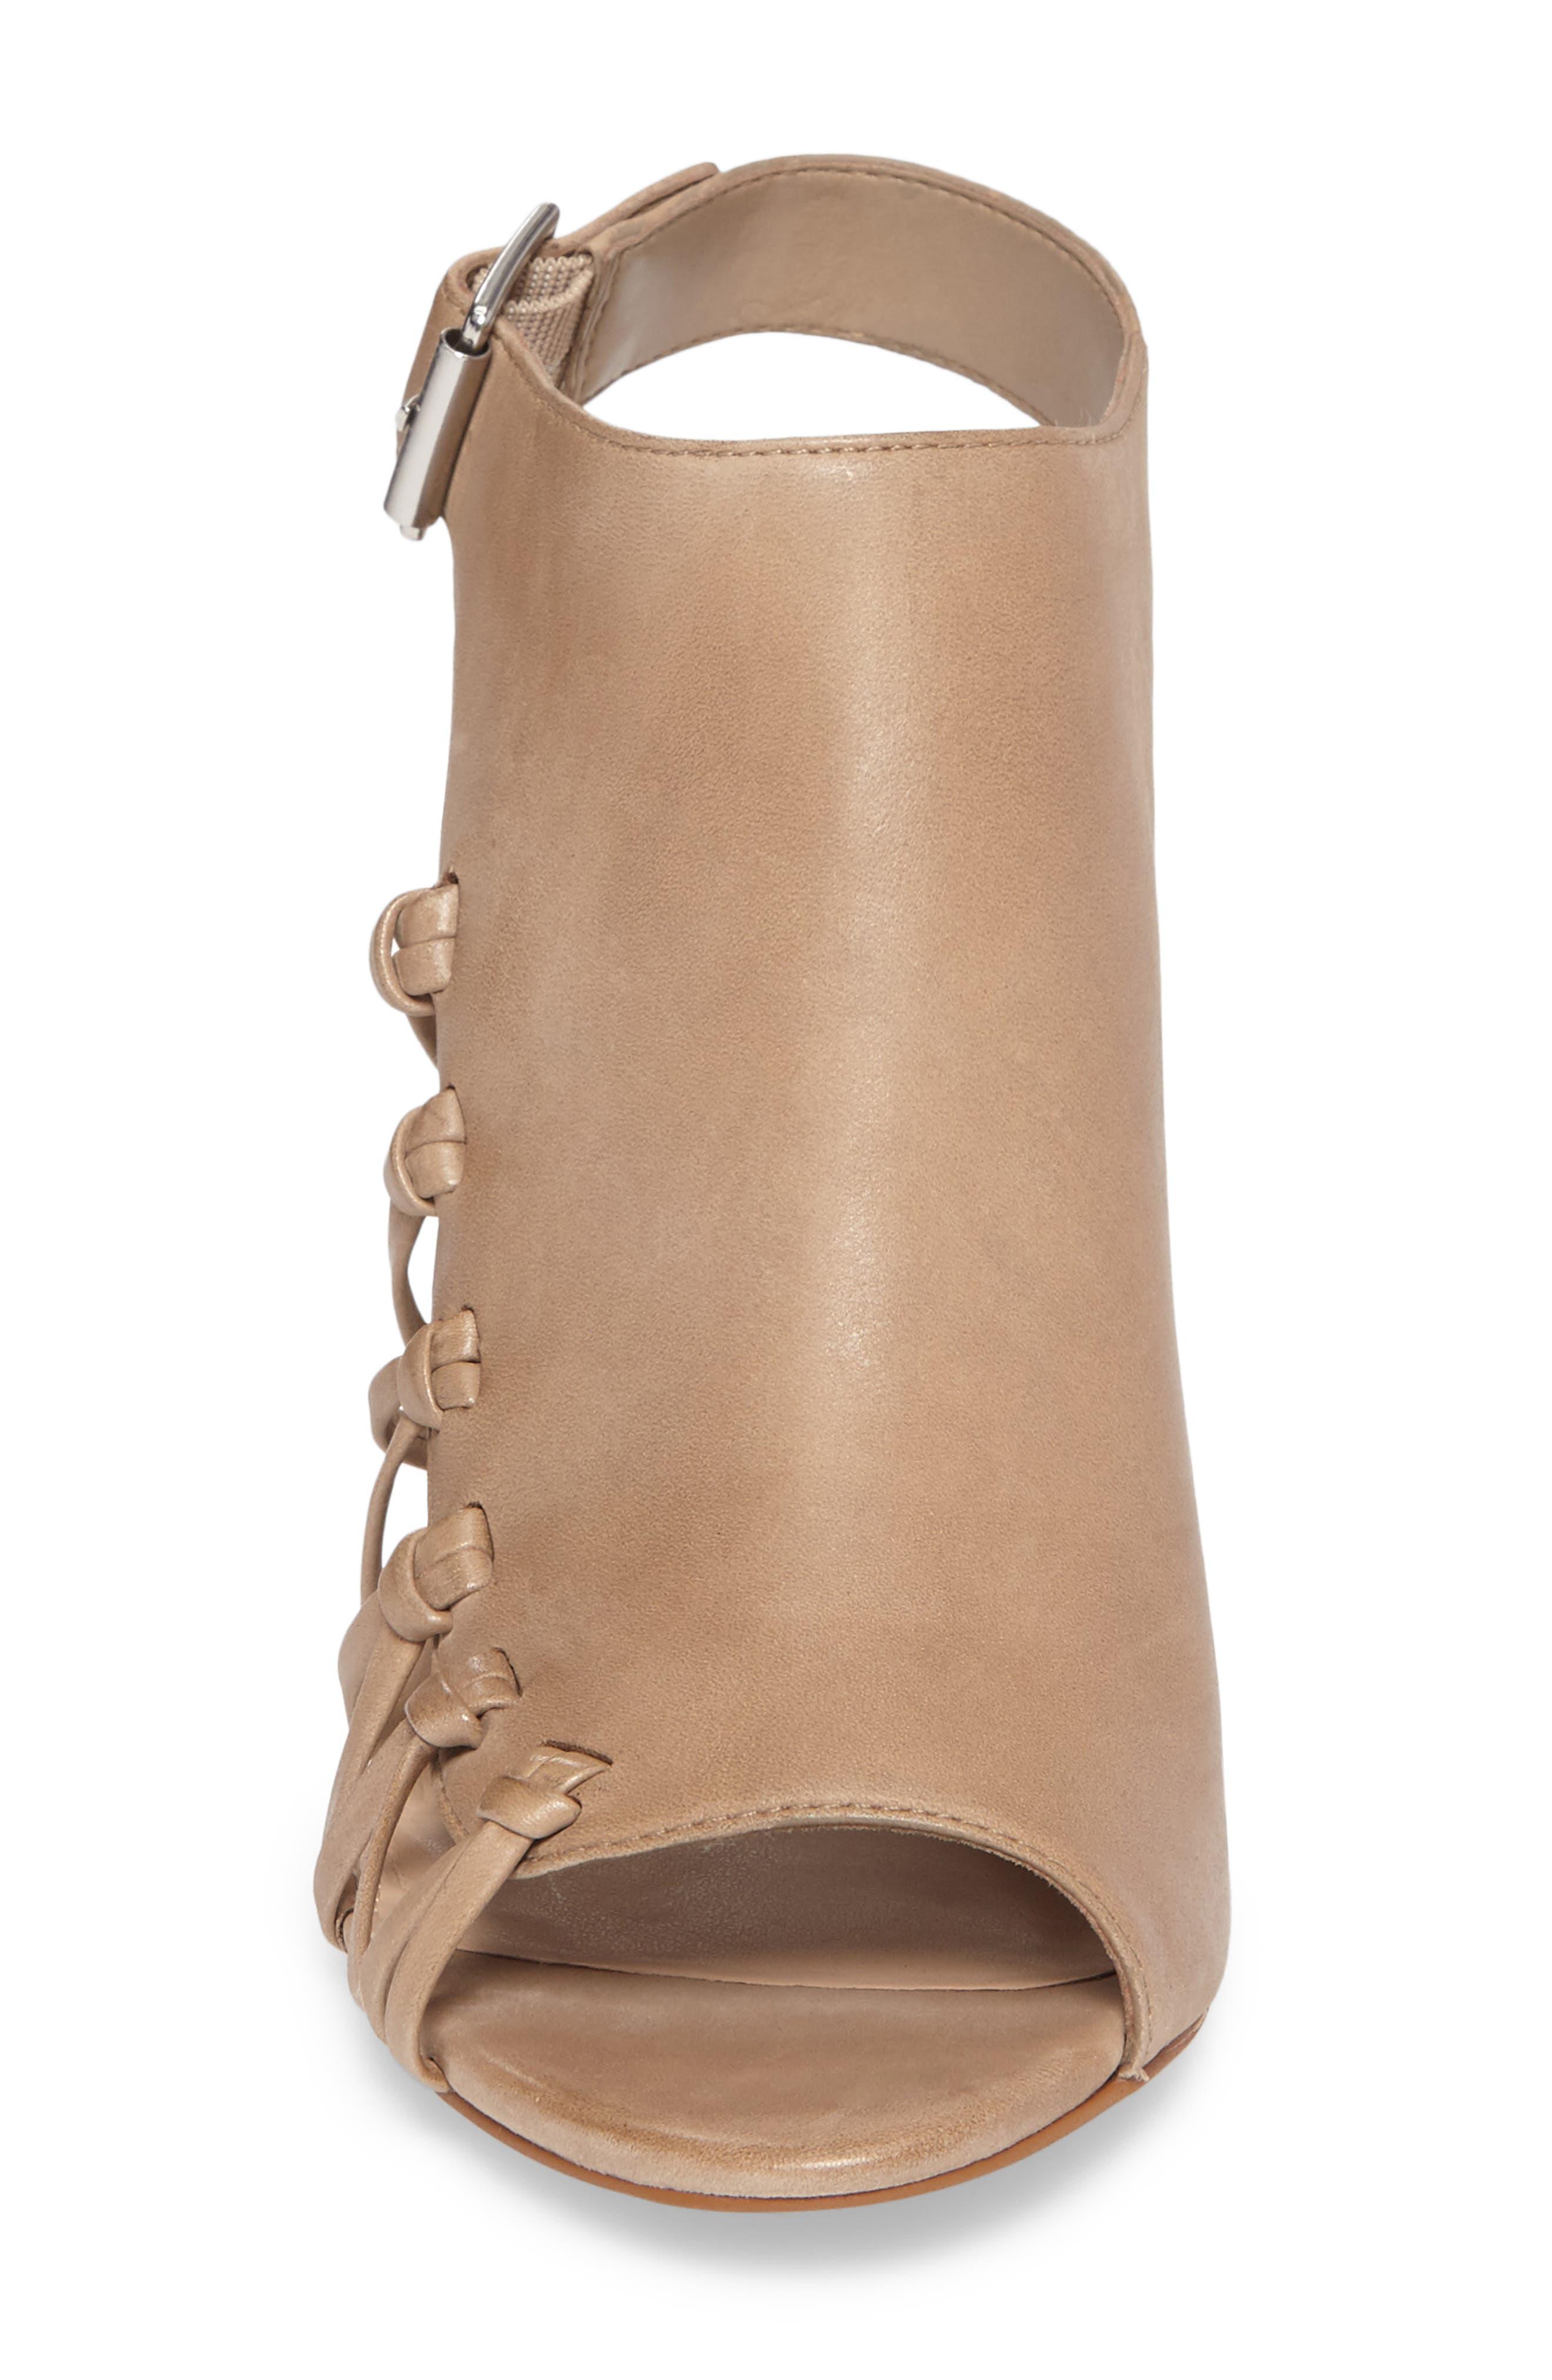 Ankara Sandal,                             Alternate thumbnail 4, color,                             Urban Beige Leather